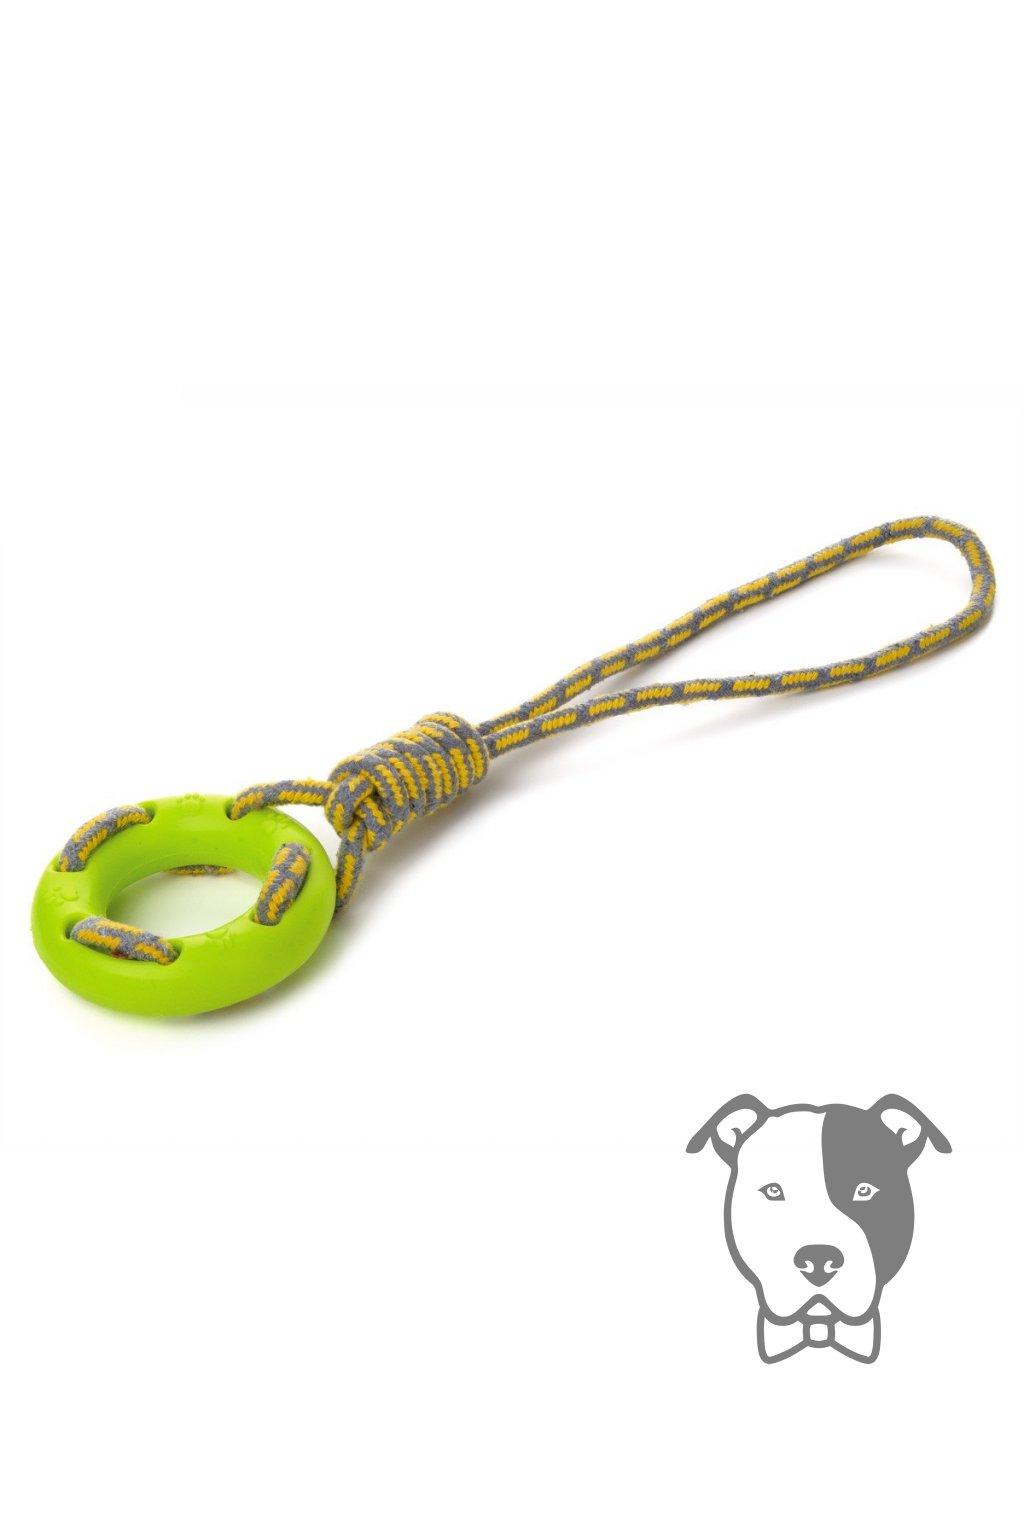 45997 1 jk animals bavlnene pretahovadlo tpr kruh 40 cm zelene 1